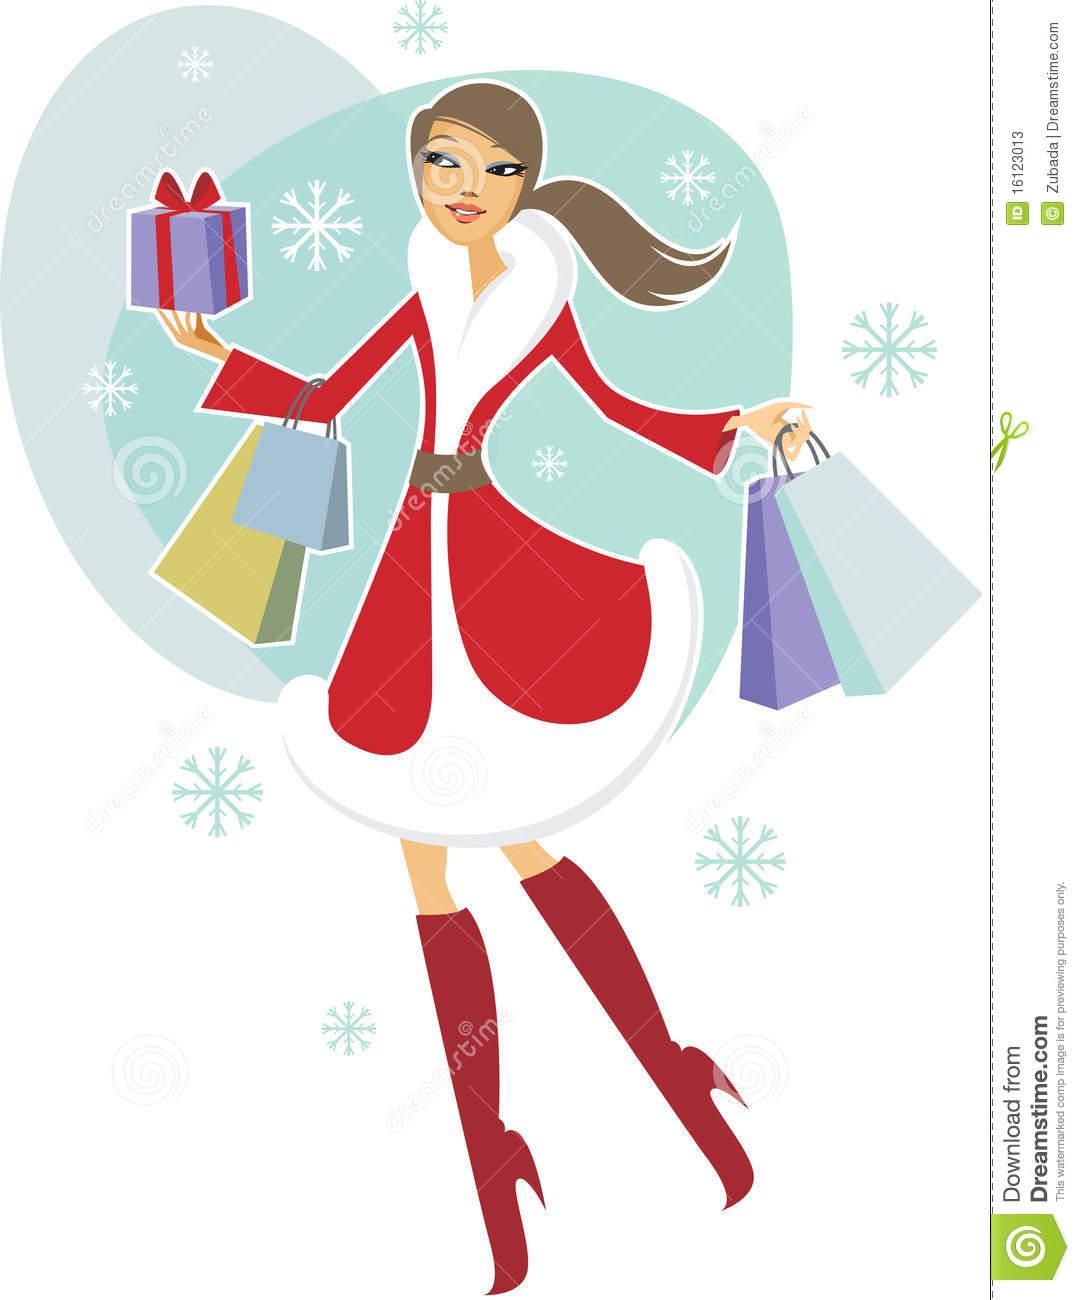 1080x1300 Women clipart christmas shopping